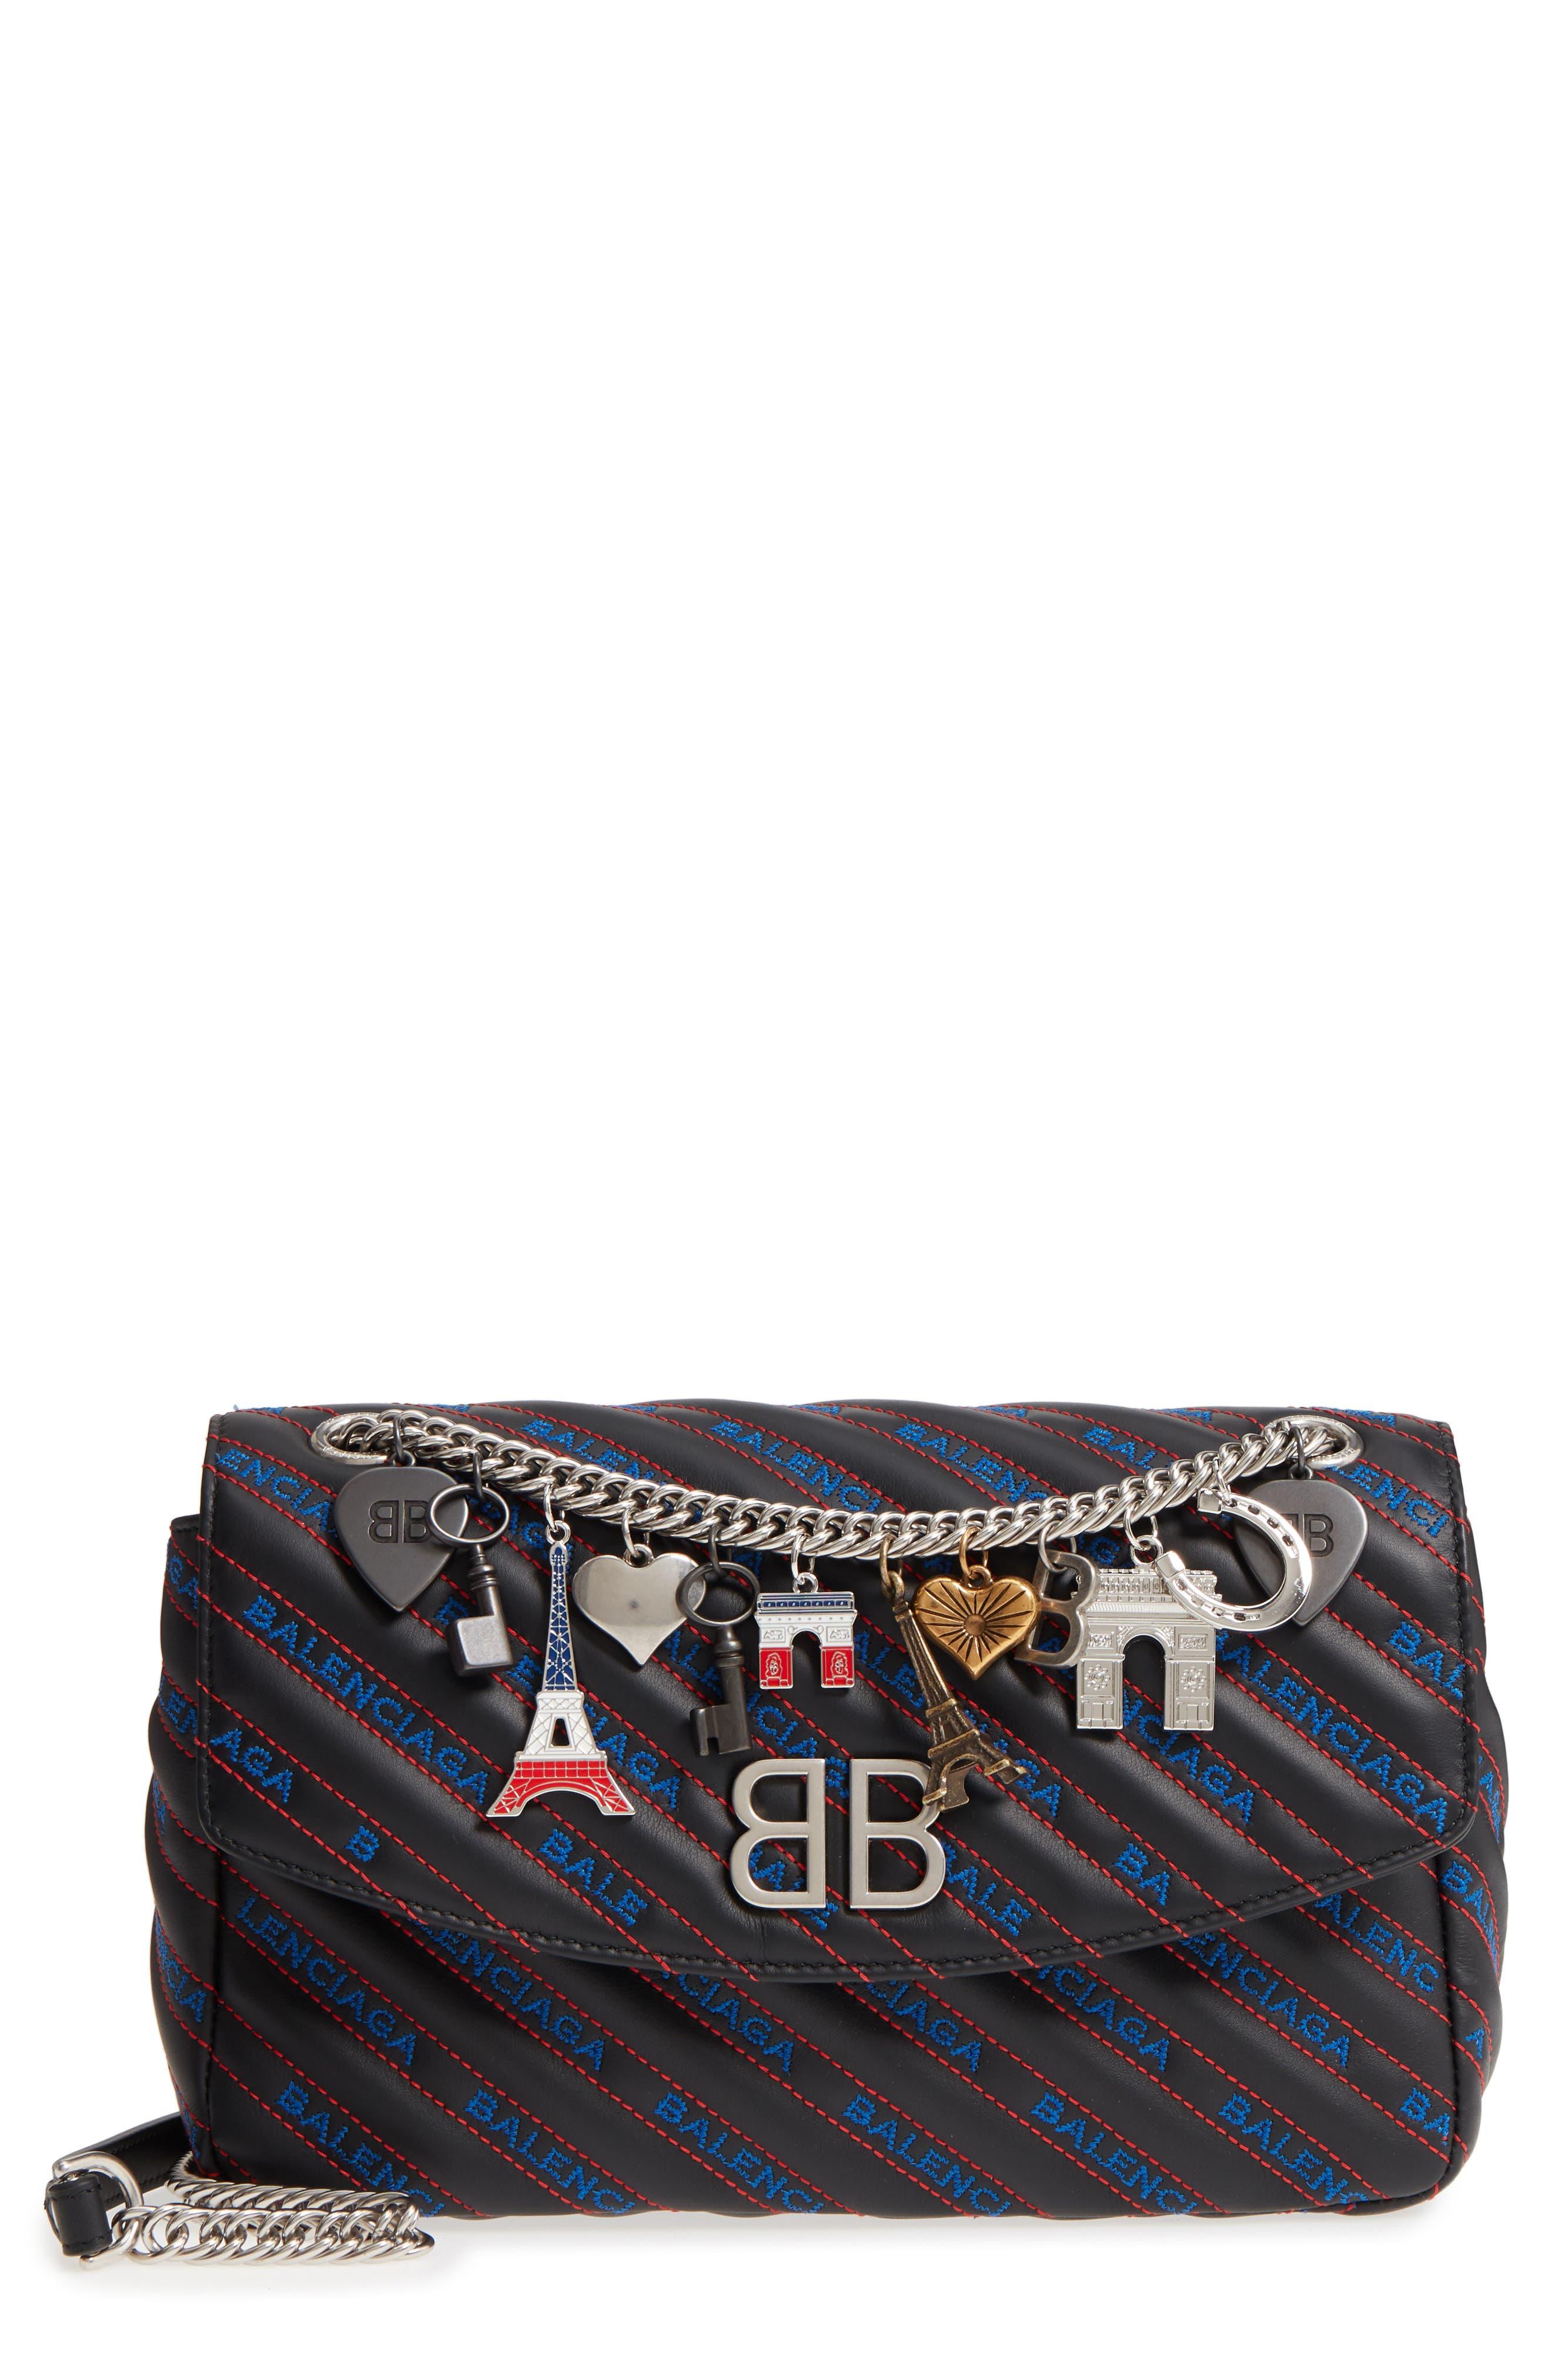 Medium BB Round Logo Charm Crossbody Bag,                         Main,                         color, Noir/ Bleu/ Rouge